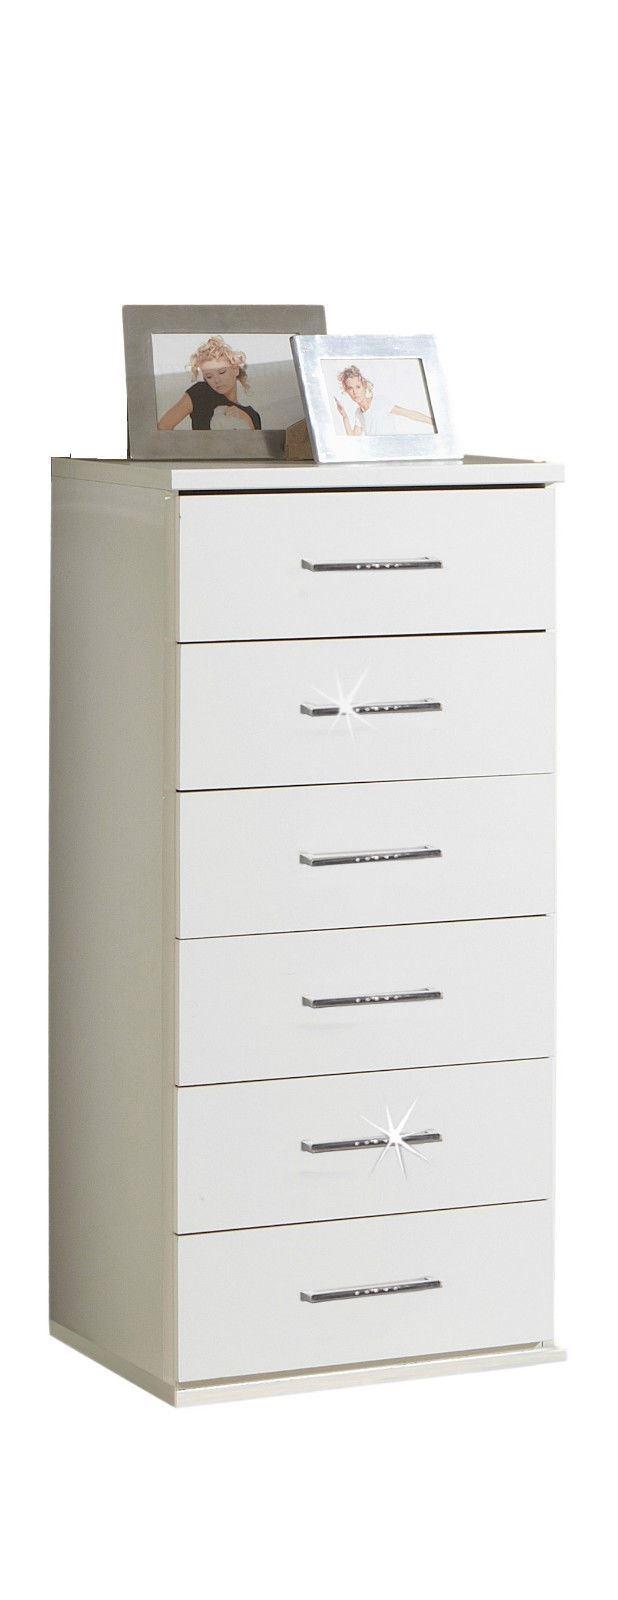 bijoux german 6 tall narrow chest of drawers white crystal rhinestone bling ebay. Black Bedroom Furniture Sets. Home Design Ideas